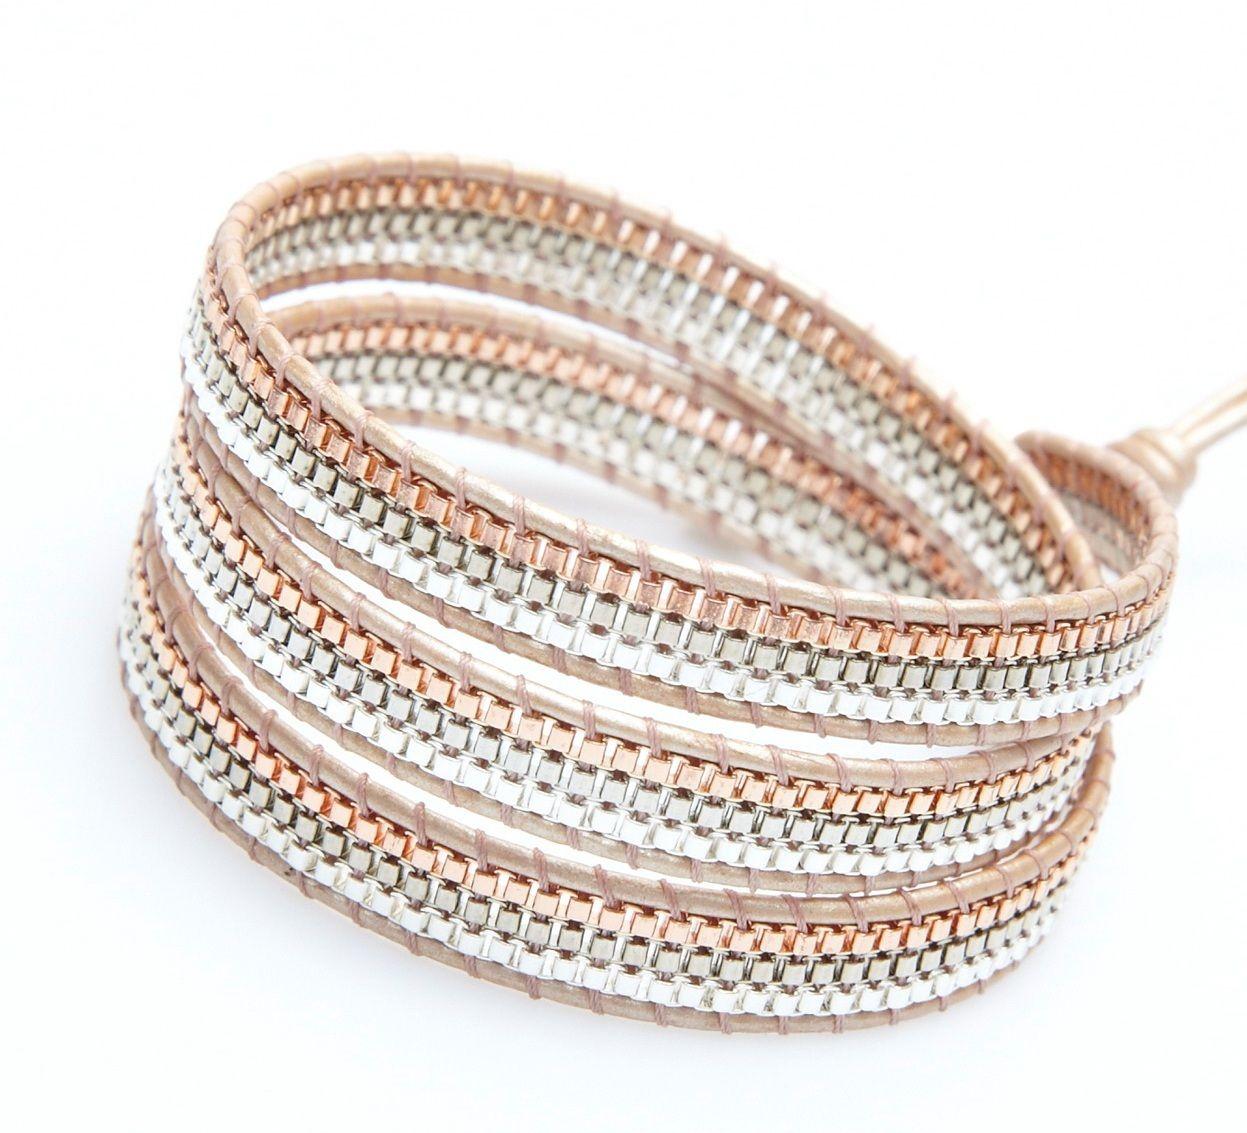 Rhode Wrap Bracelet-Mix by Nakamol - Nakamol Chicago